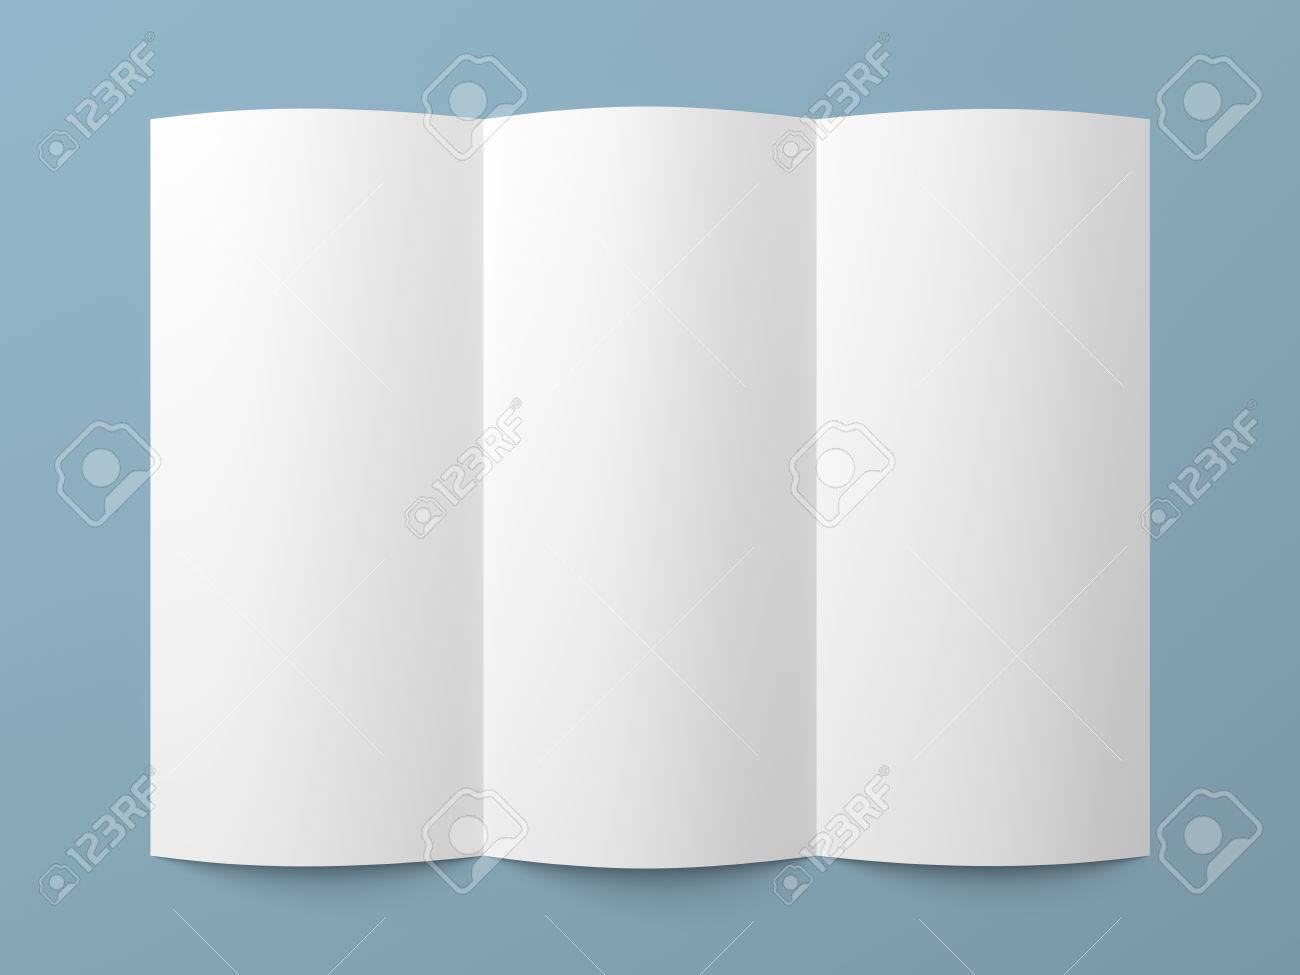 Blank Tri Fold Brochure Template Blank Powerpoint Brochure – Blank Tri Fold Brochure Template